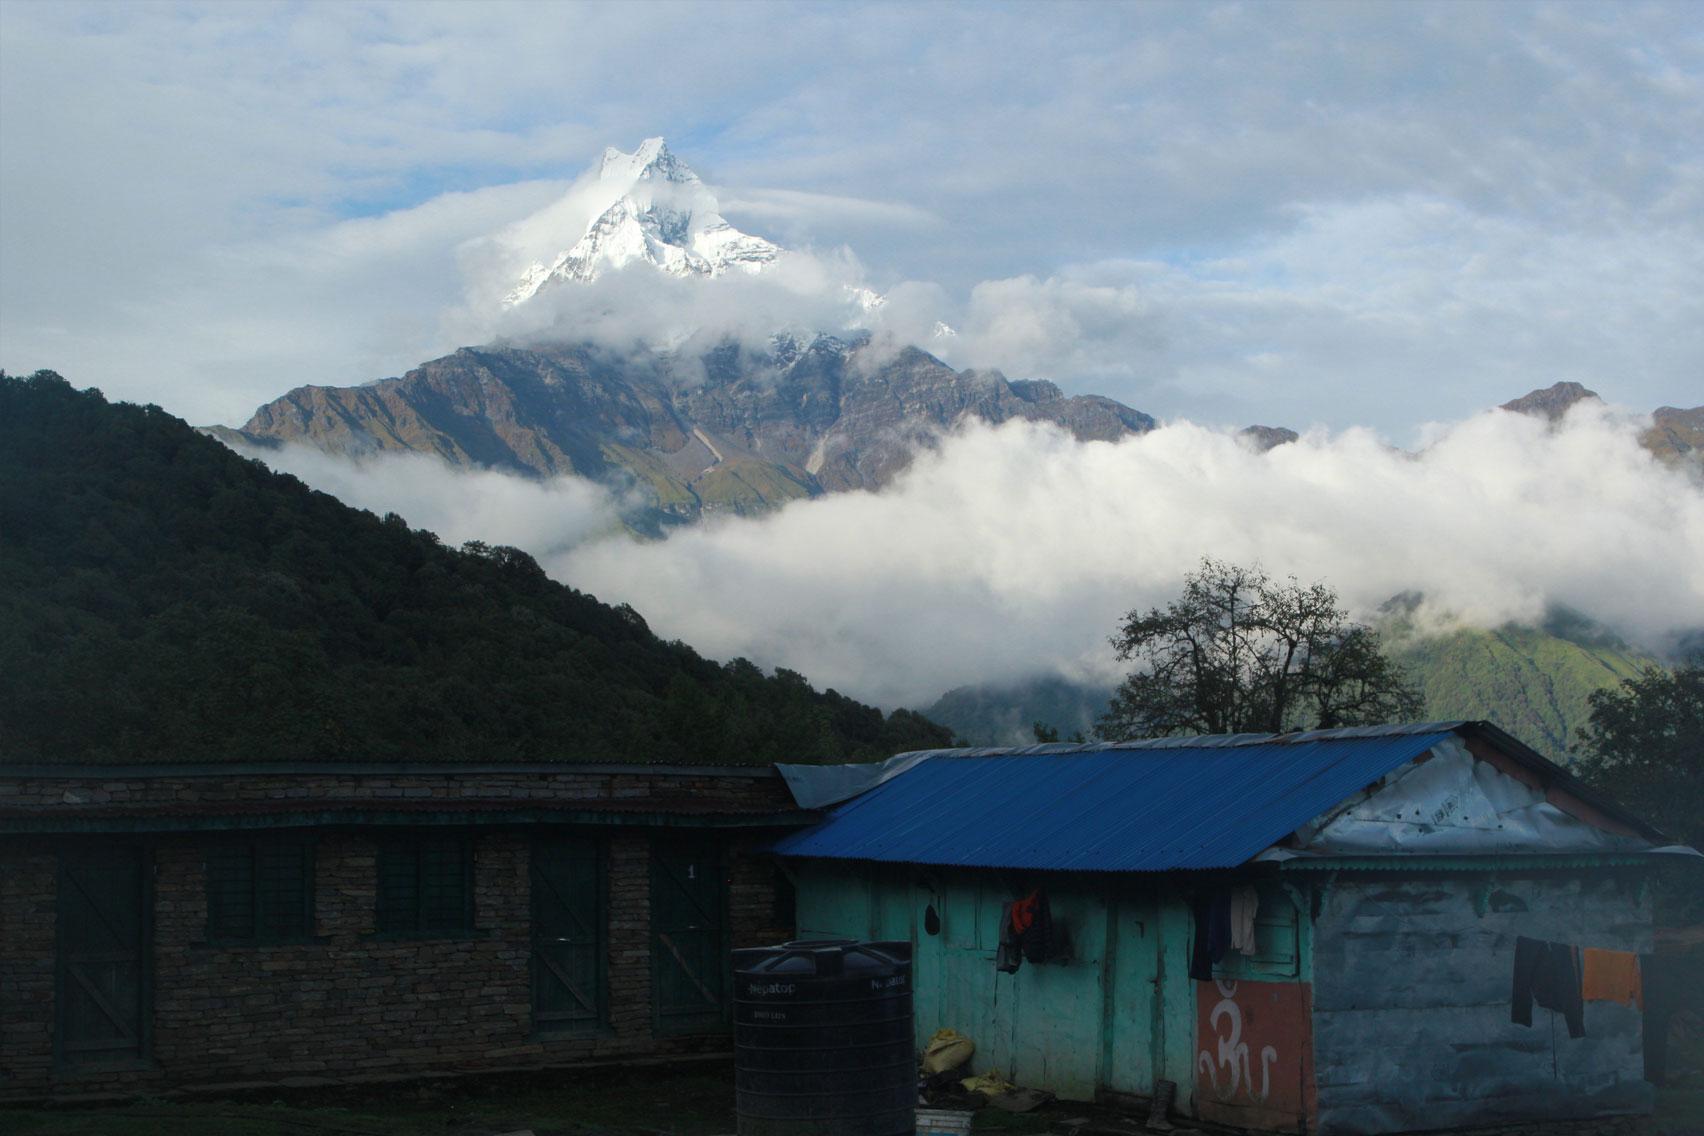 Day 4: Trek from Pothana (1890m) to Jungle Camp/Koker (5 hrs, 2525m)